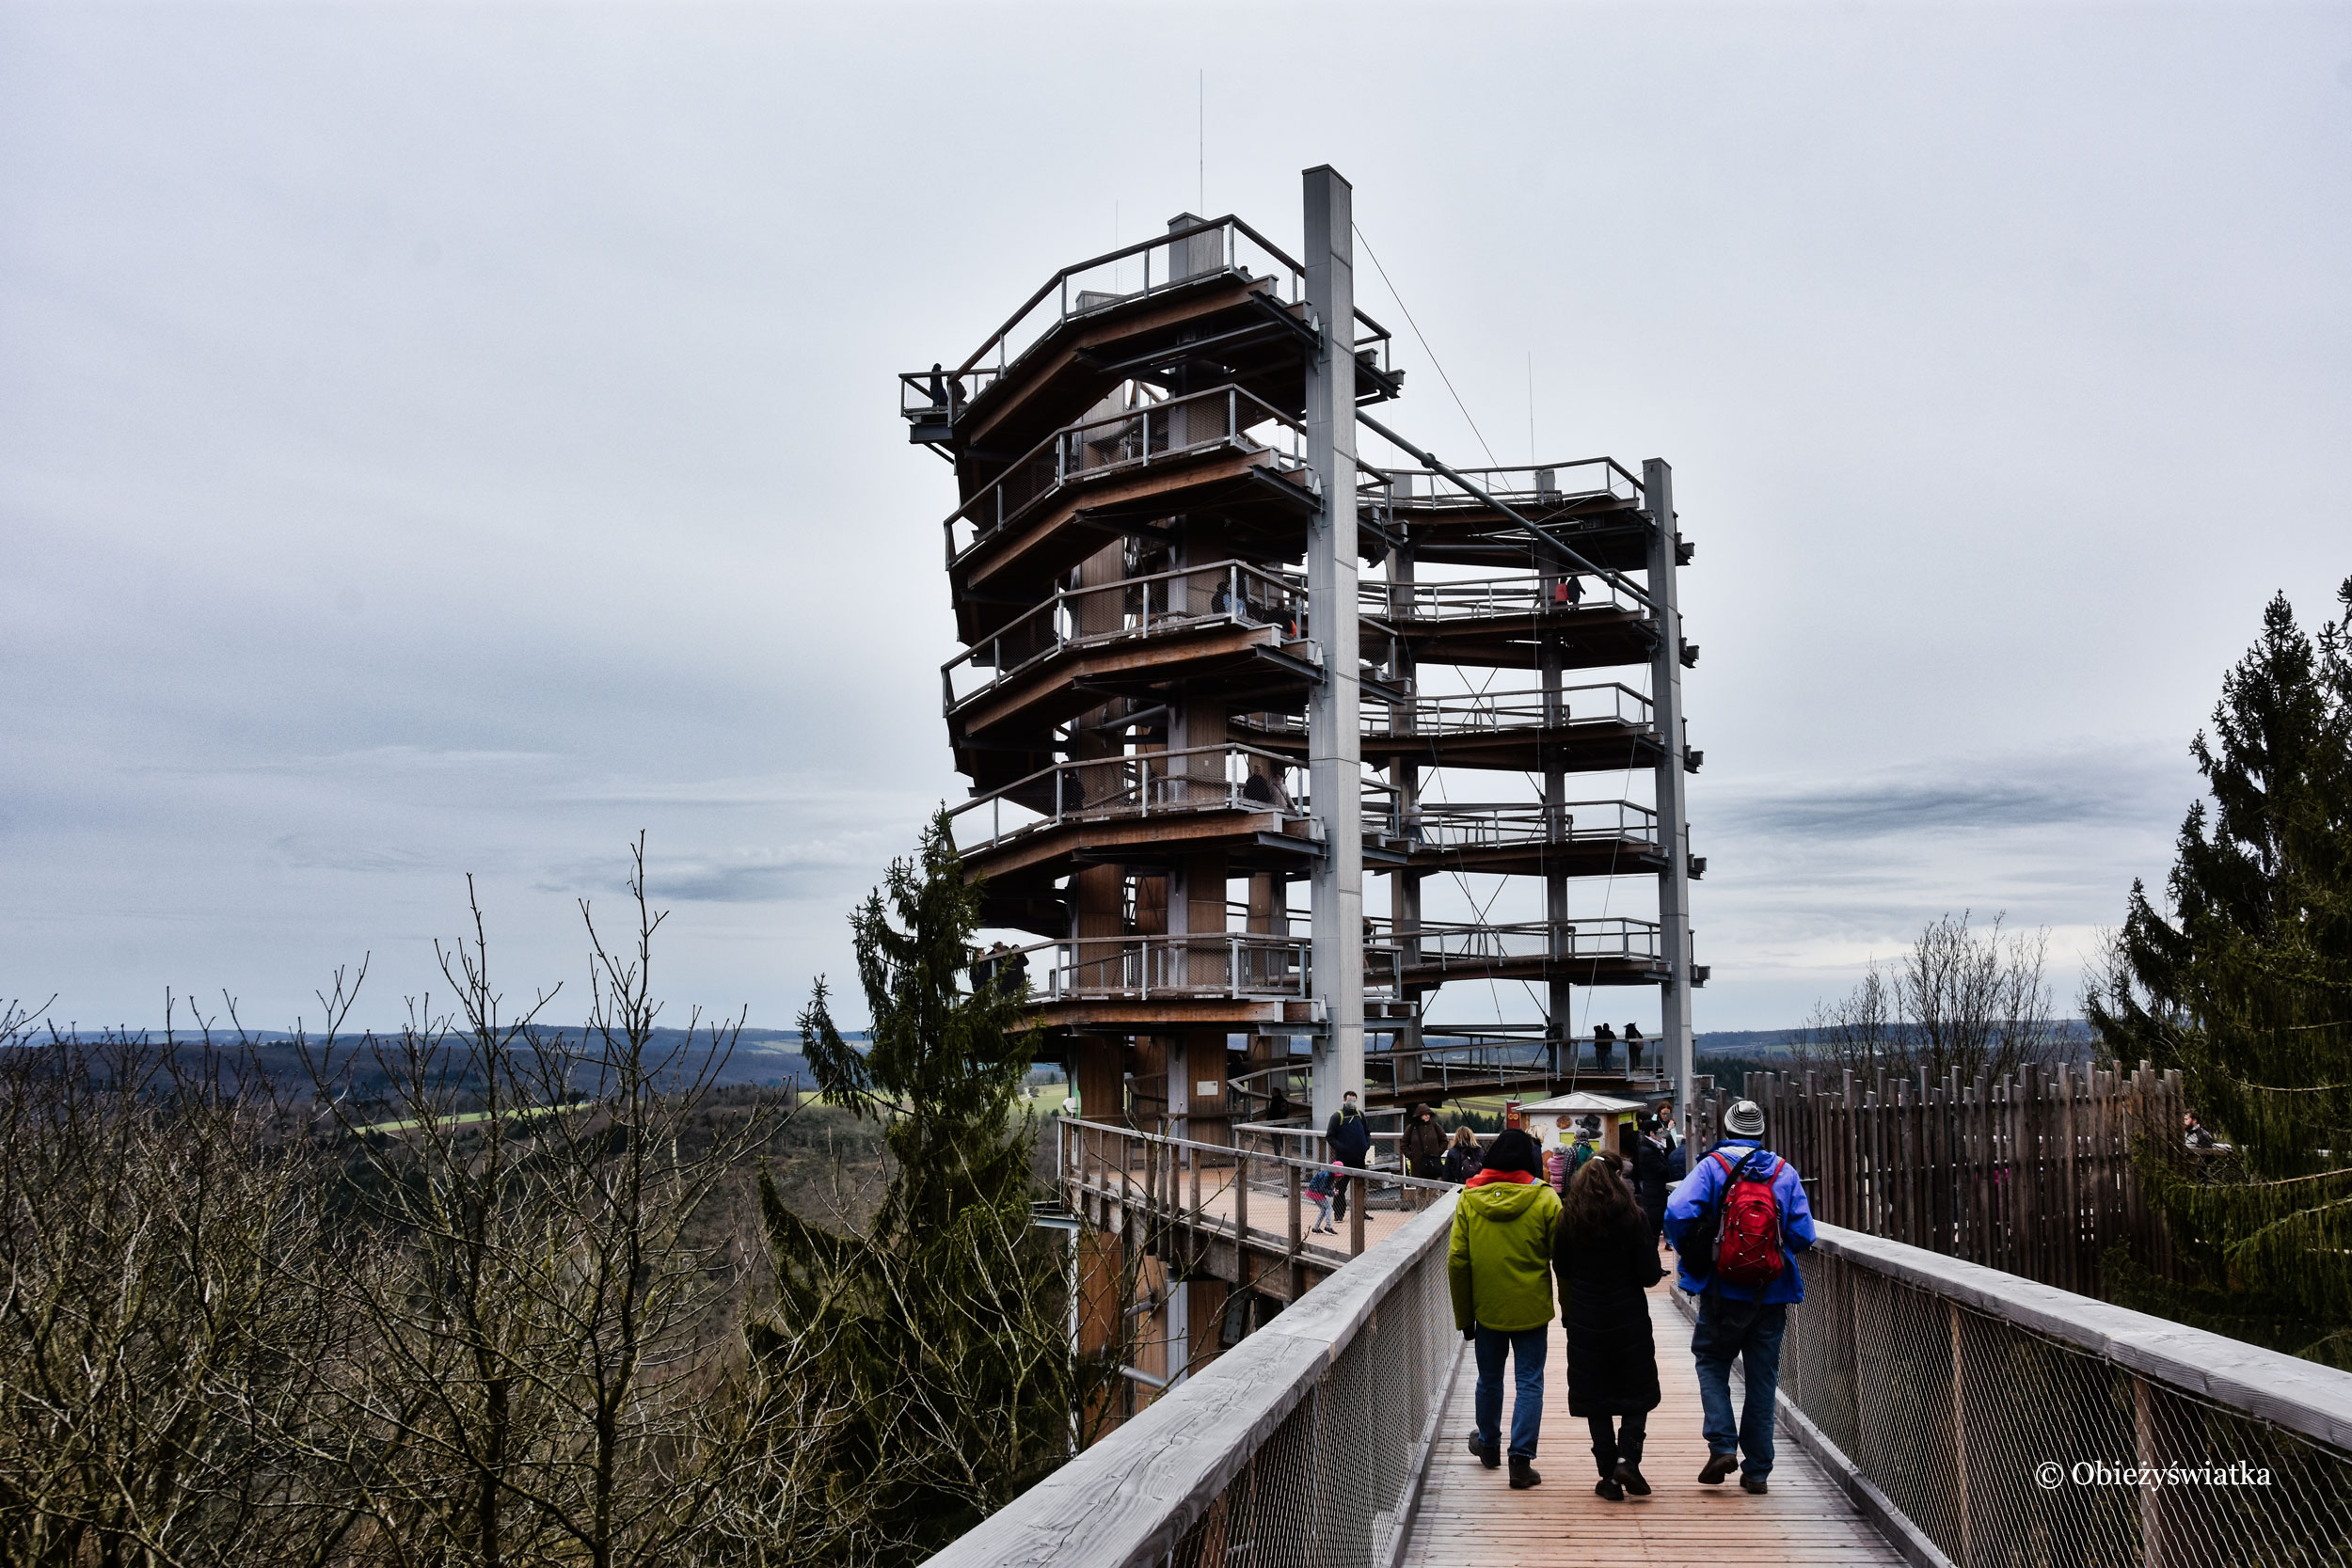 Wieża widokowa Saarschleife